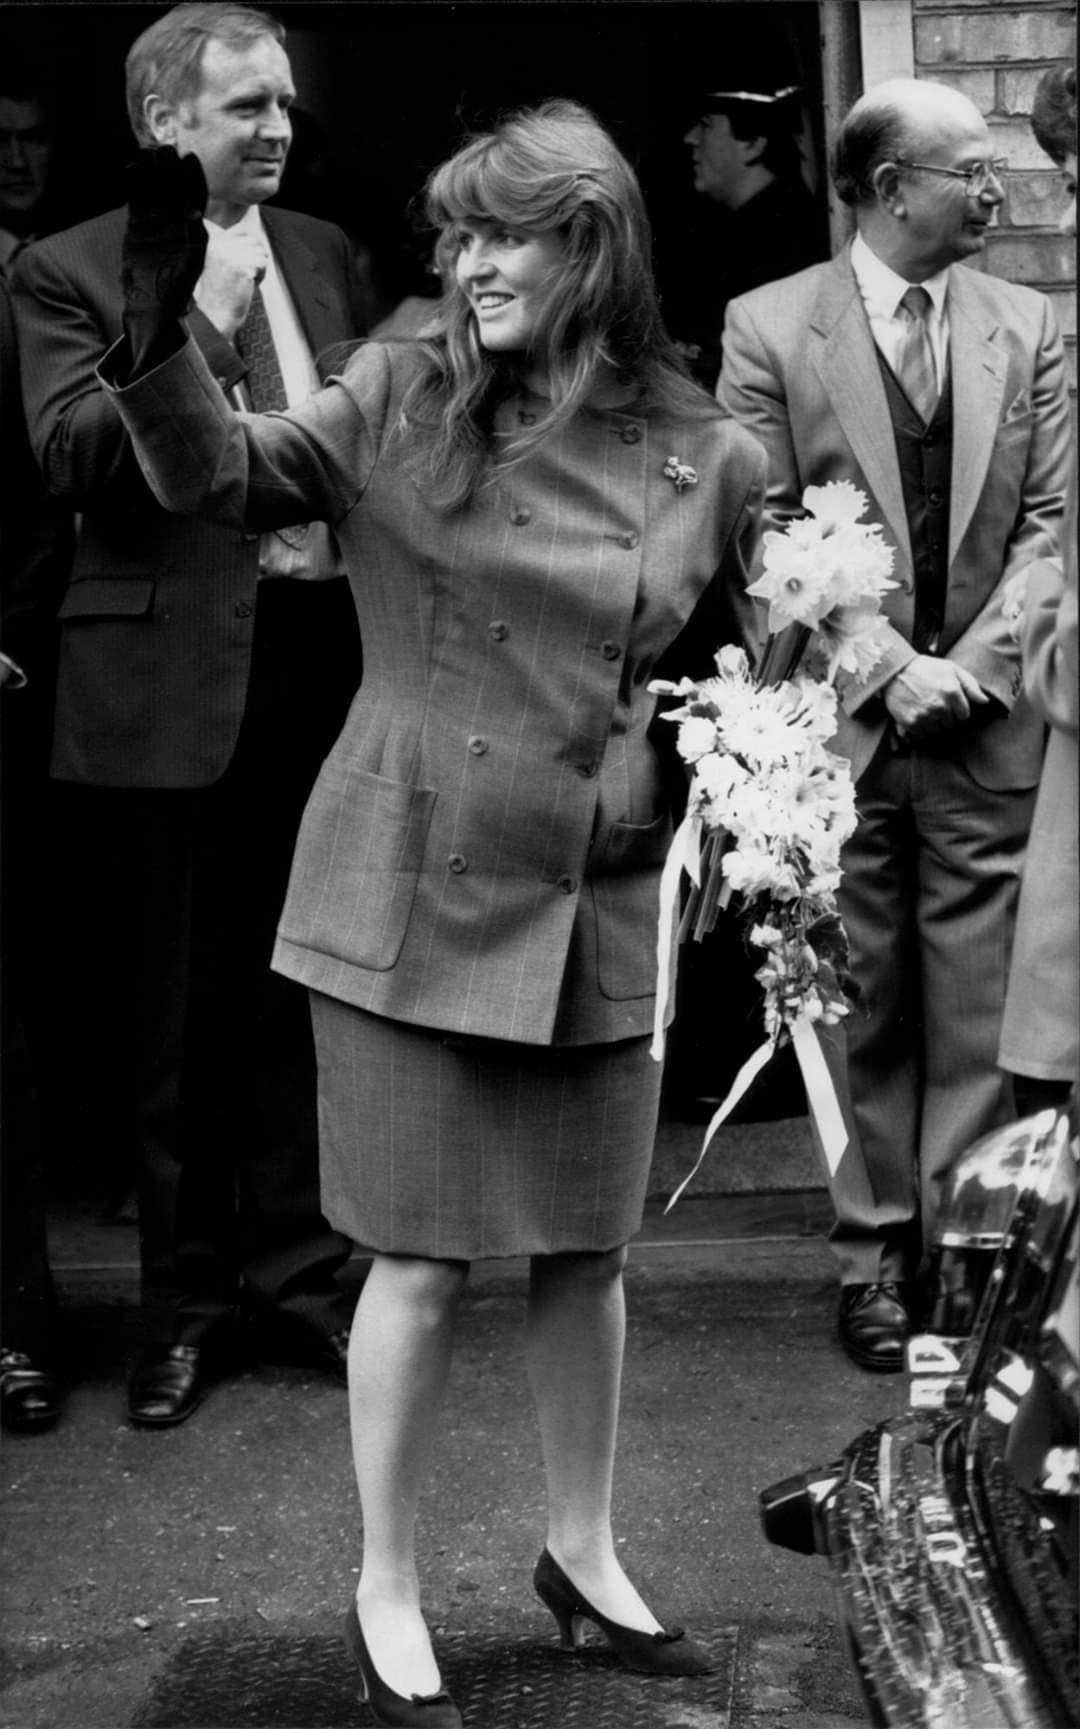 Sarah Duchess of York in Leavesden in 1988. Photo: Leavesden Hospital History Association